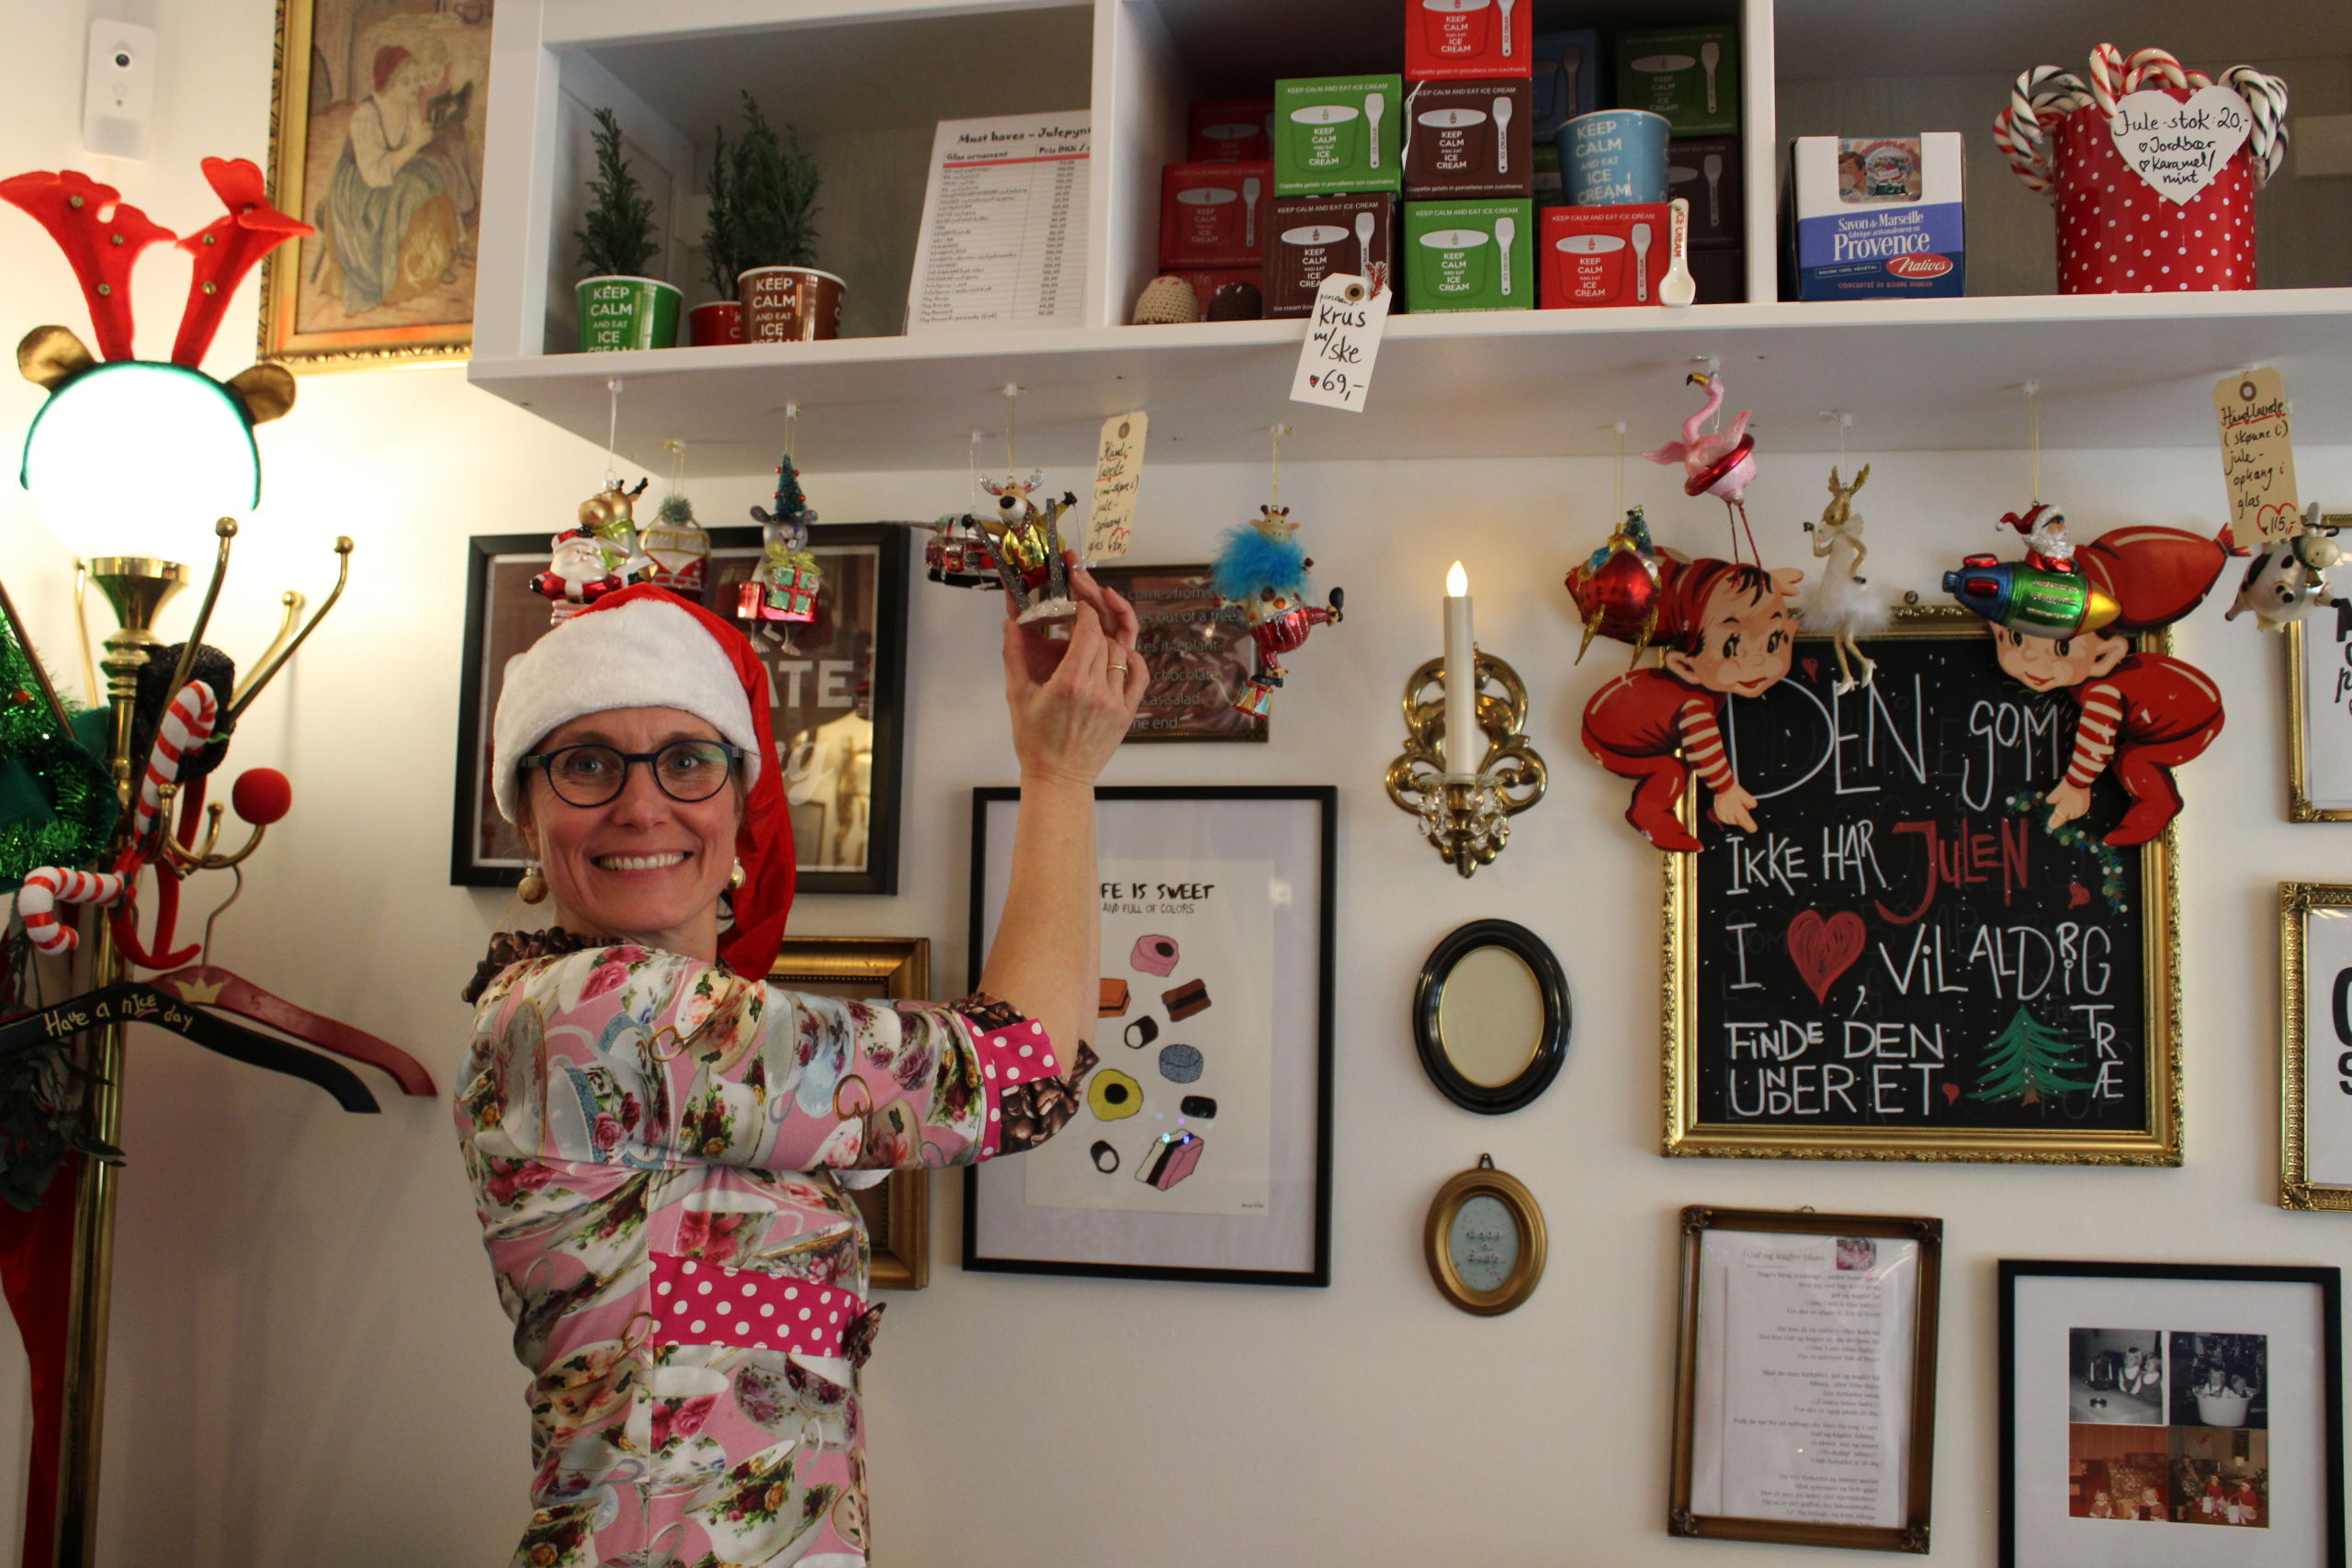 Hjemlig julehygge: Guf og Kugler går amok i pynt og hjemmelavede æbleskiver